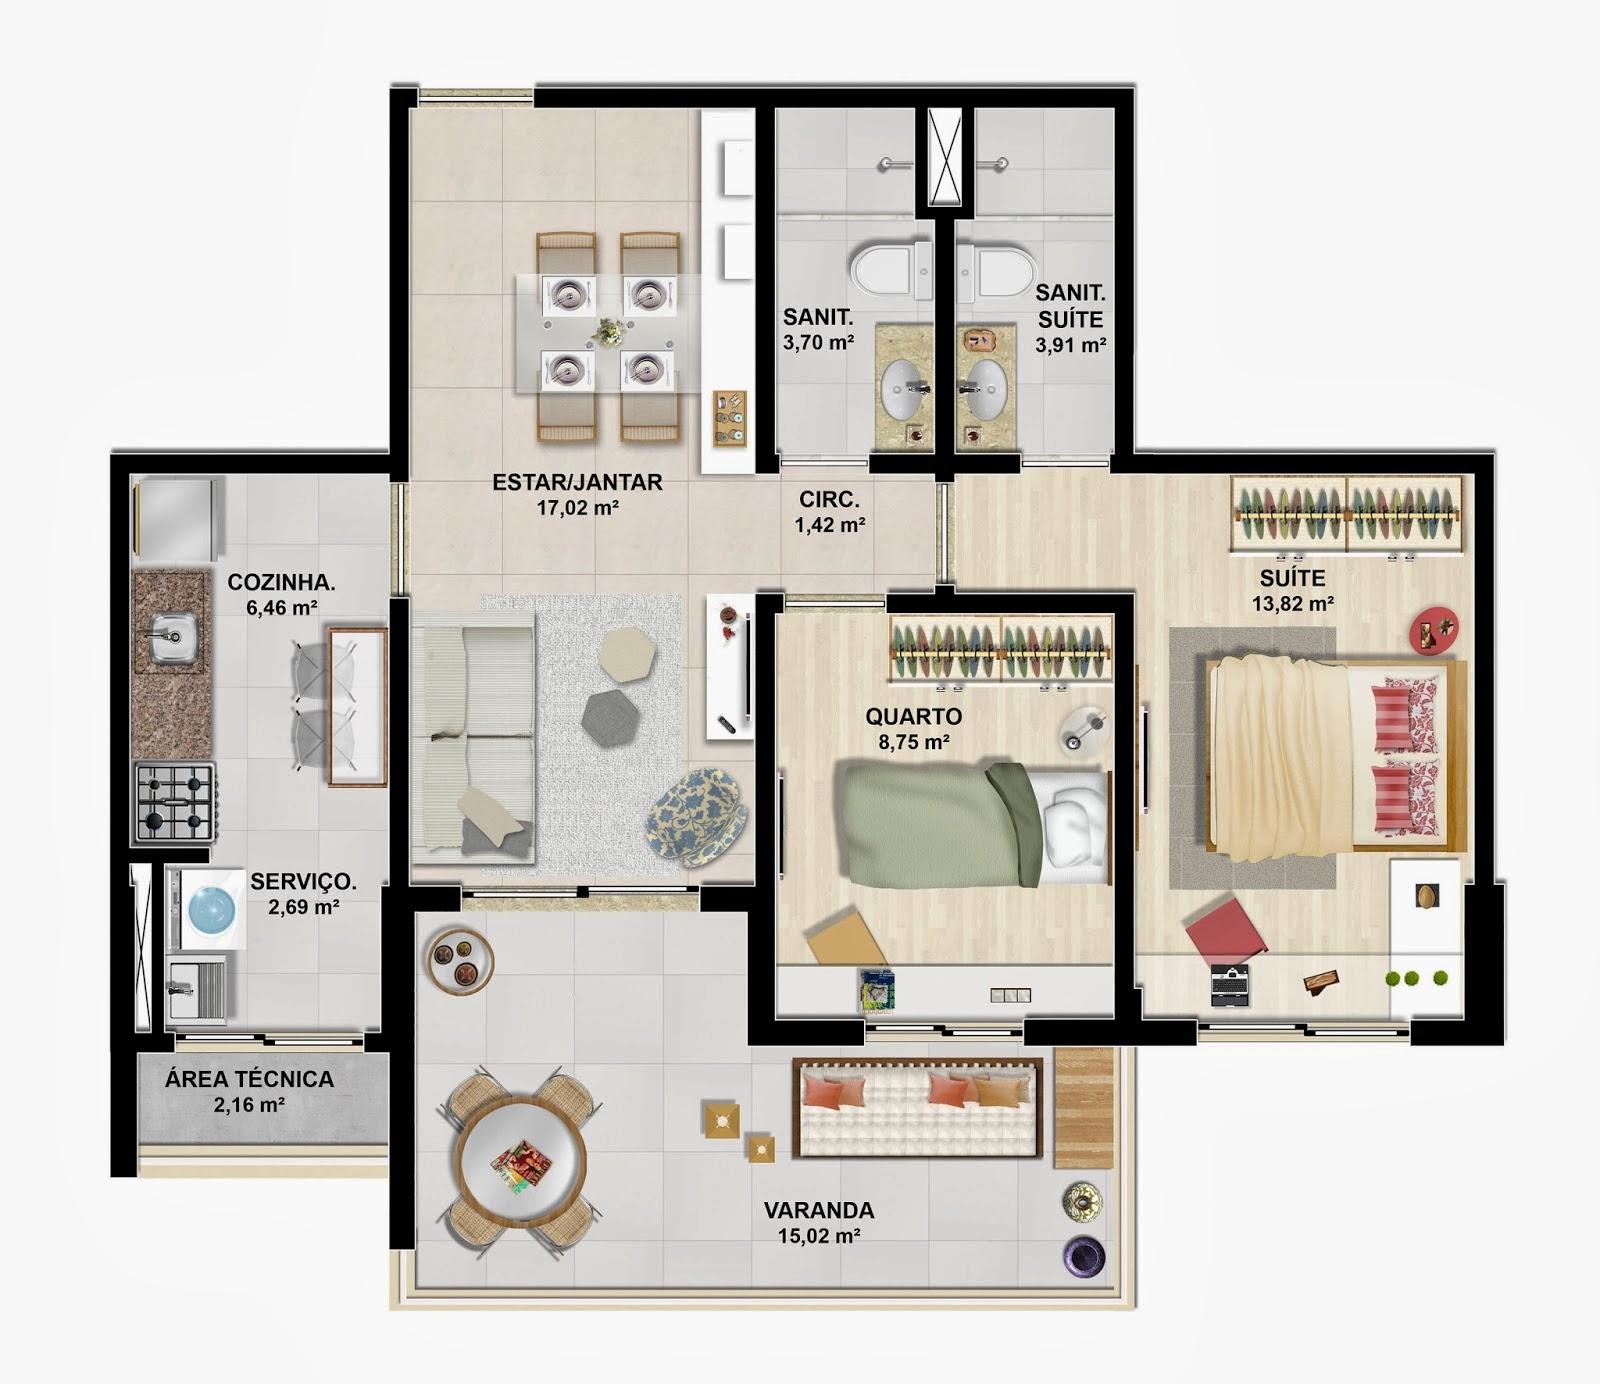 verano residencial - tipo 75m²